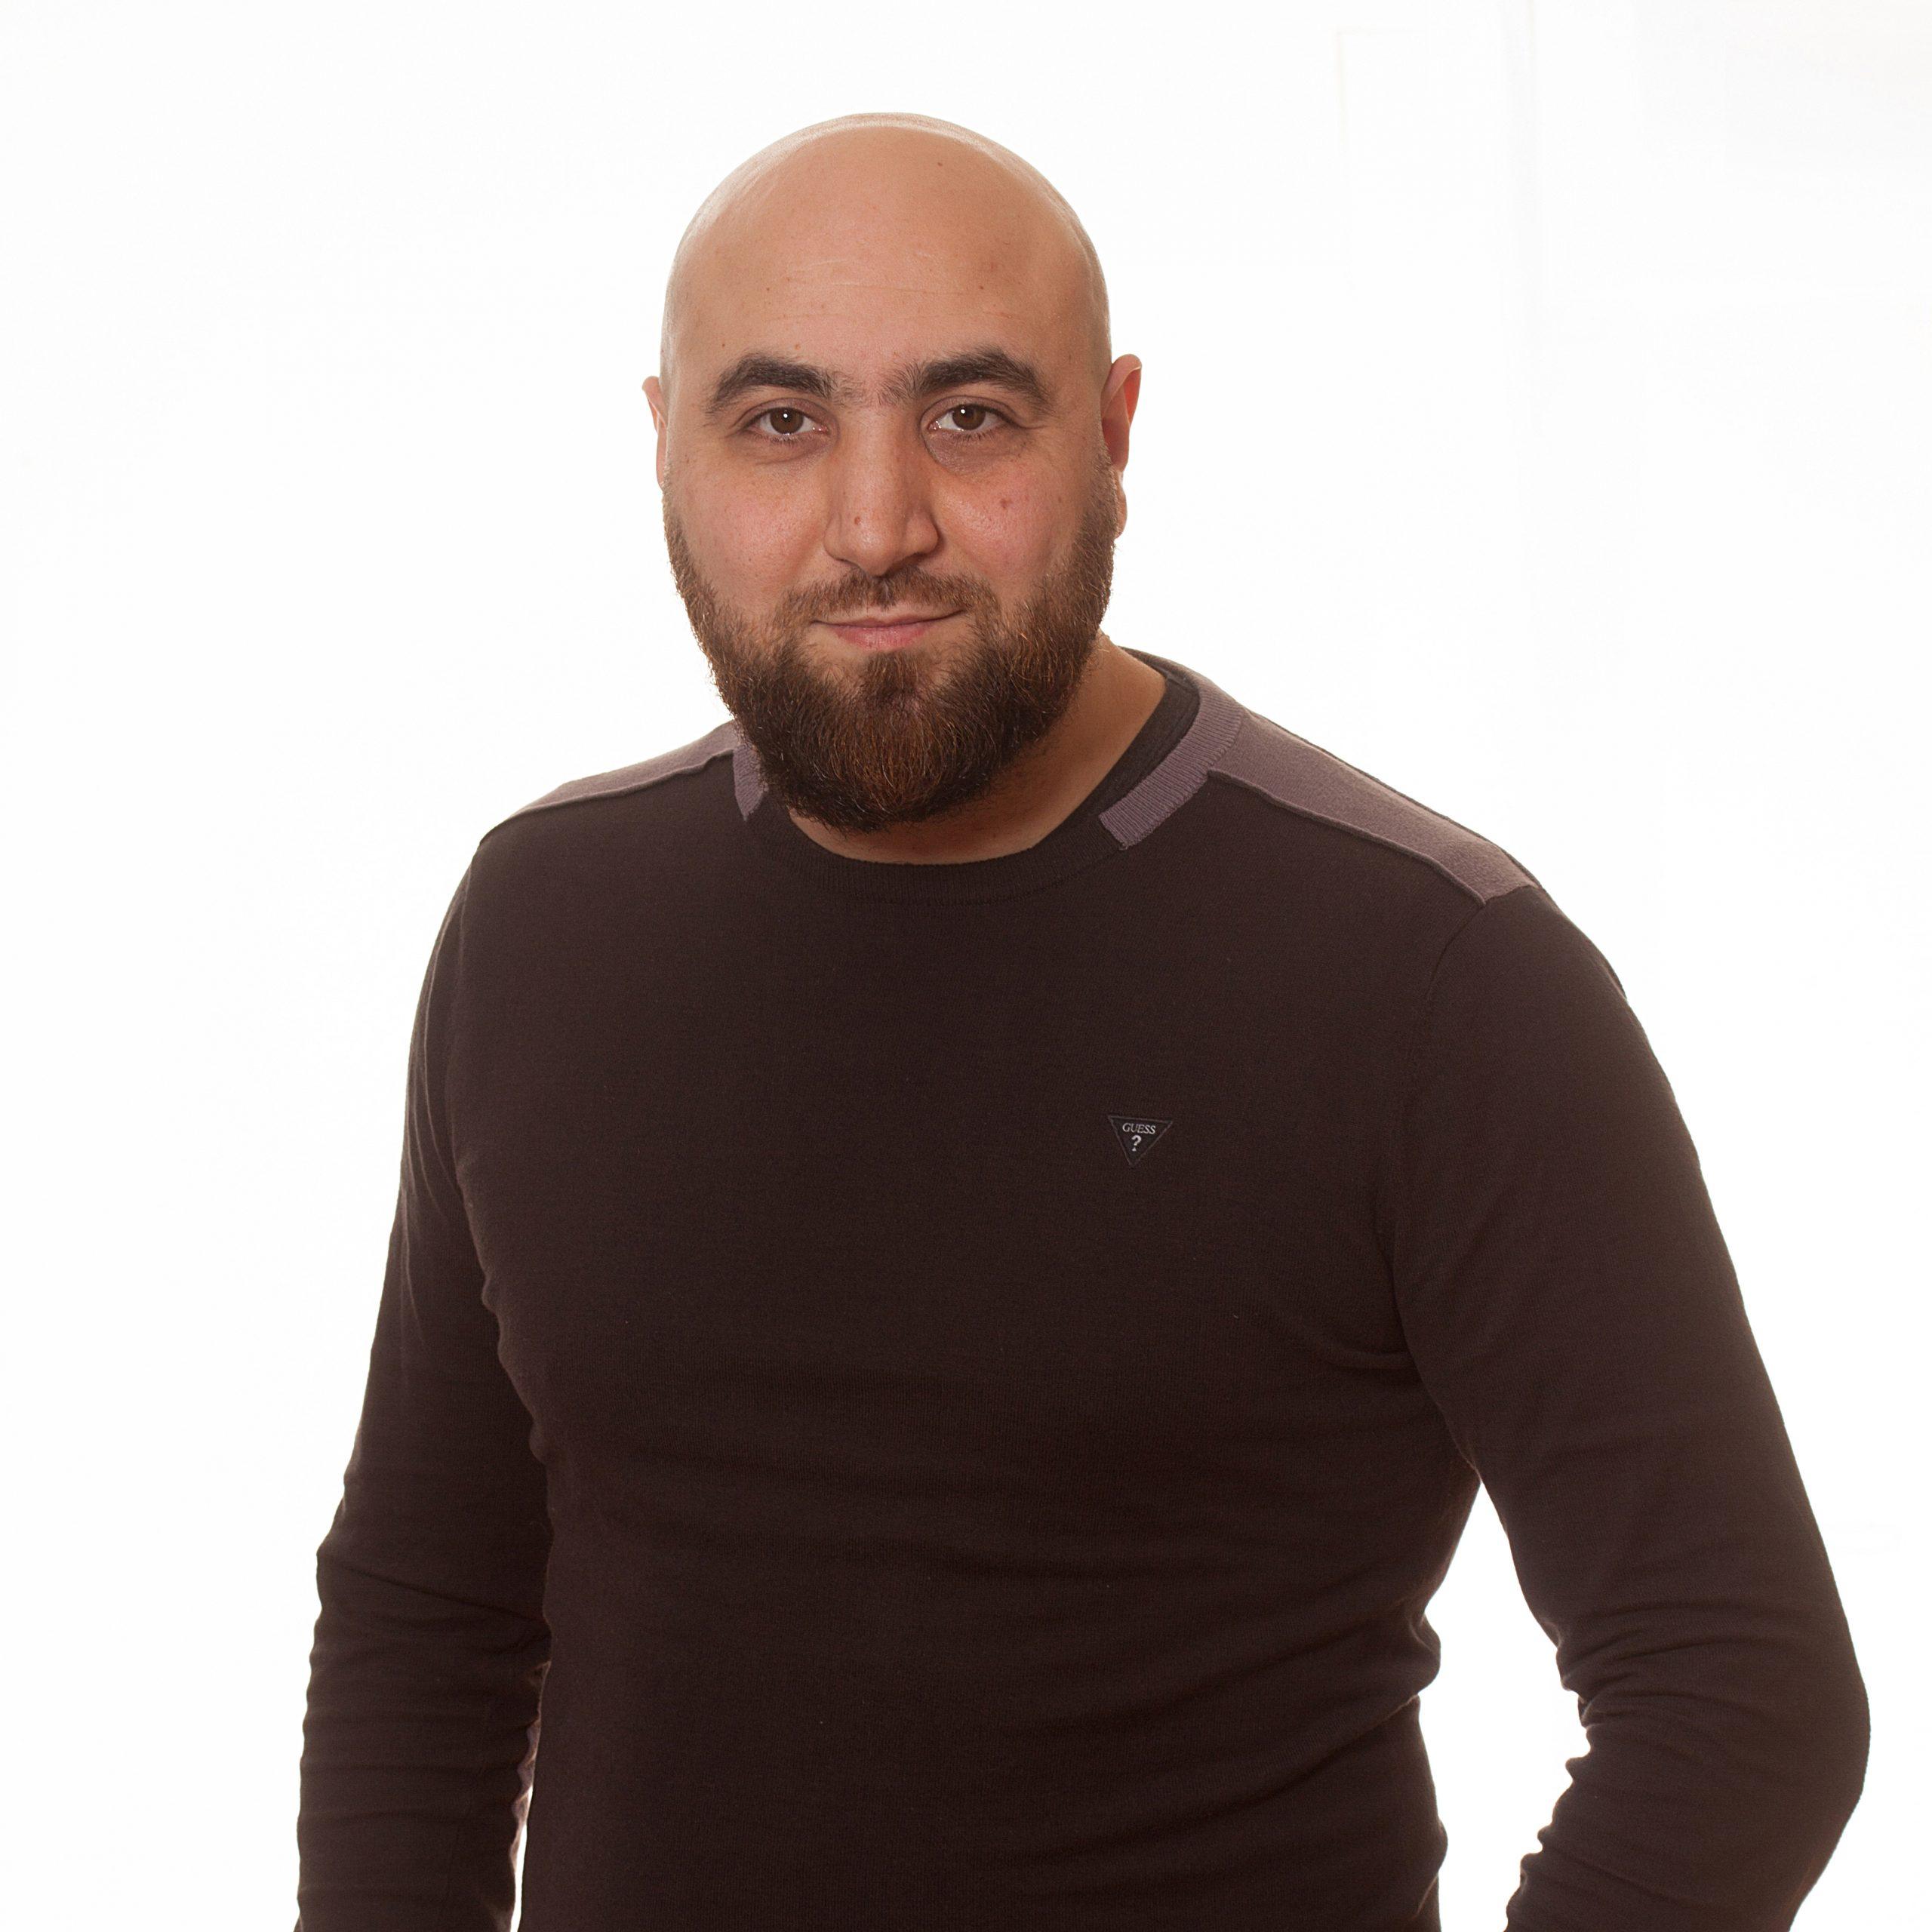 Bilal Dahmane